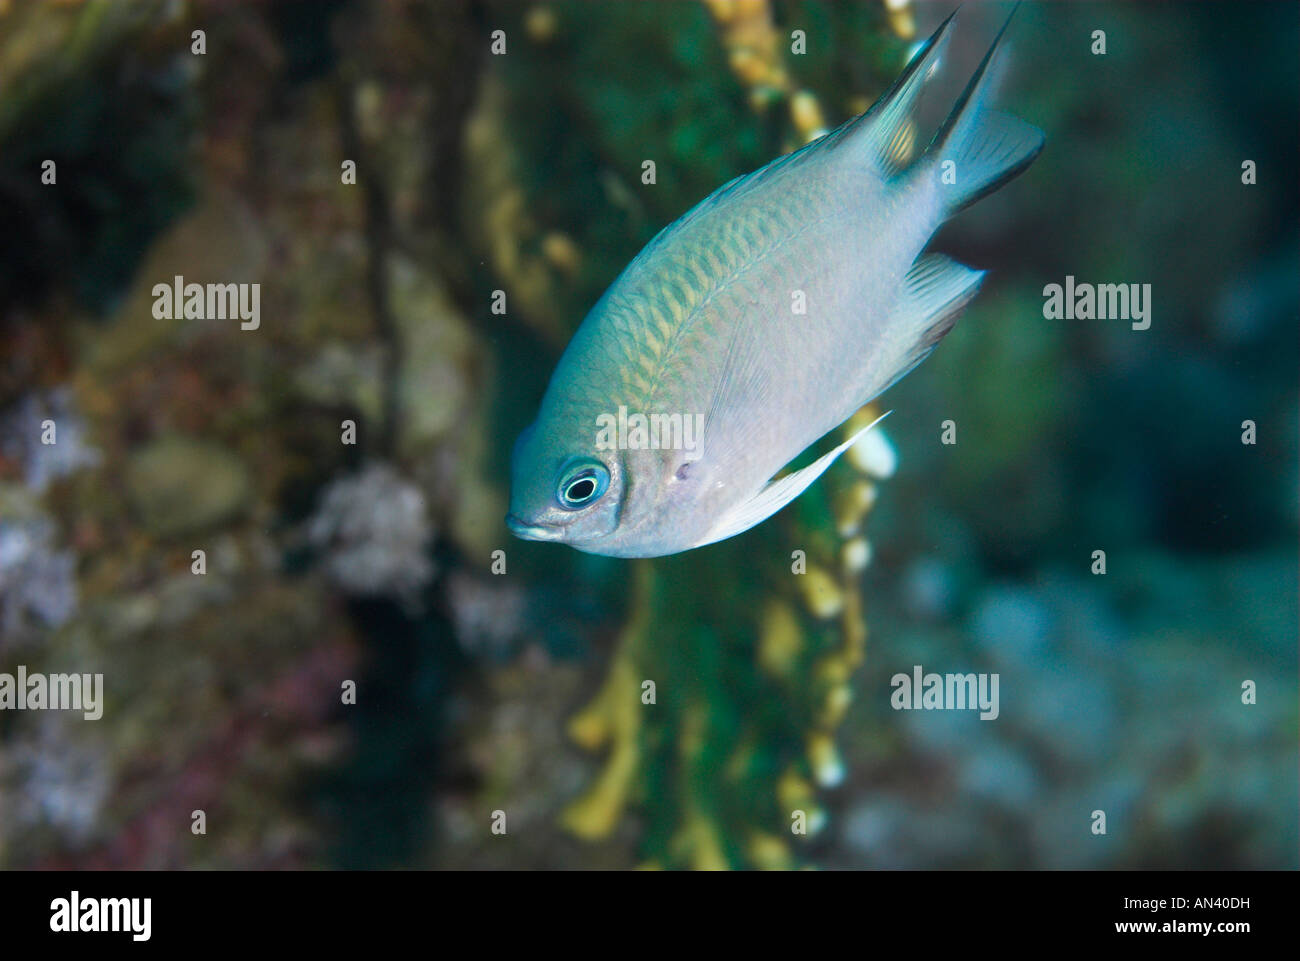 Bluegreen puller or damselfish fish Chromis viridis Red Sea - Stock Image